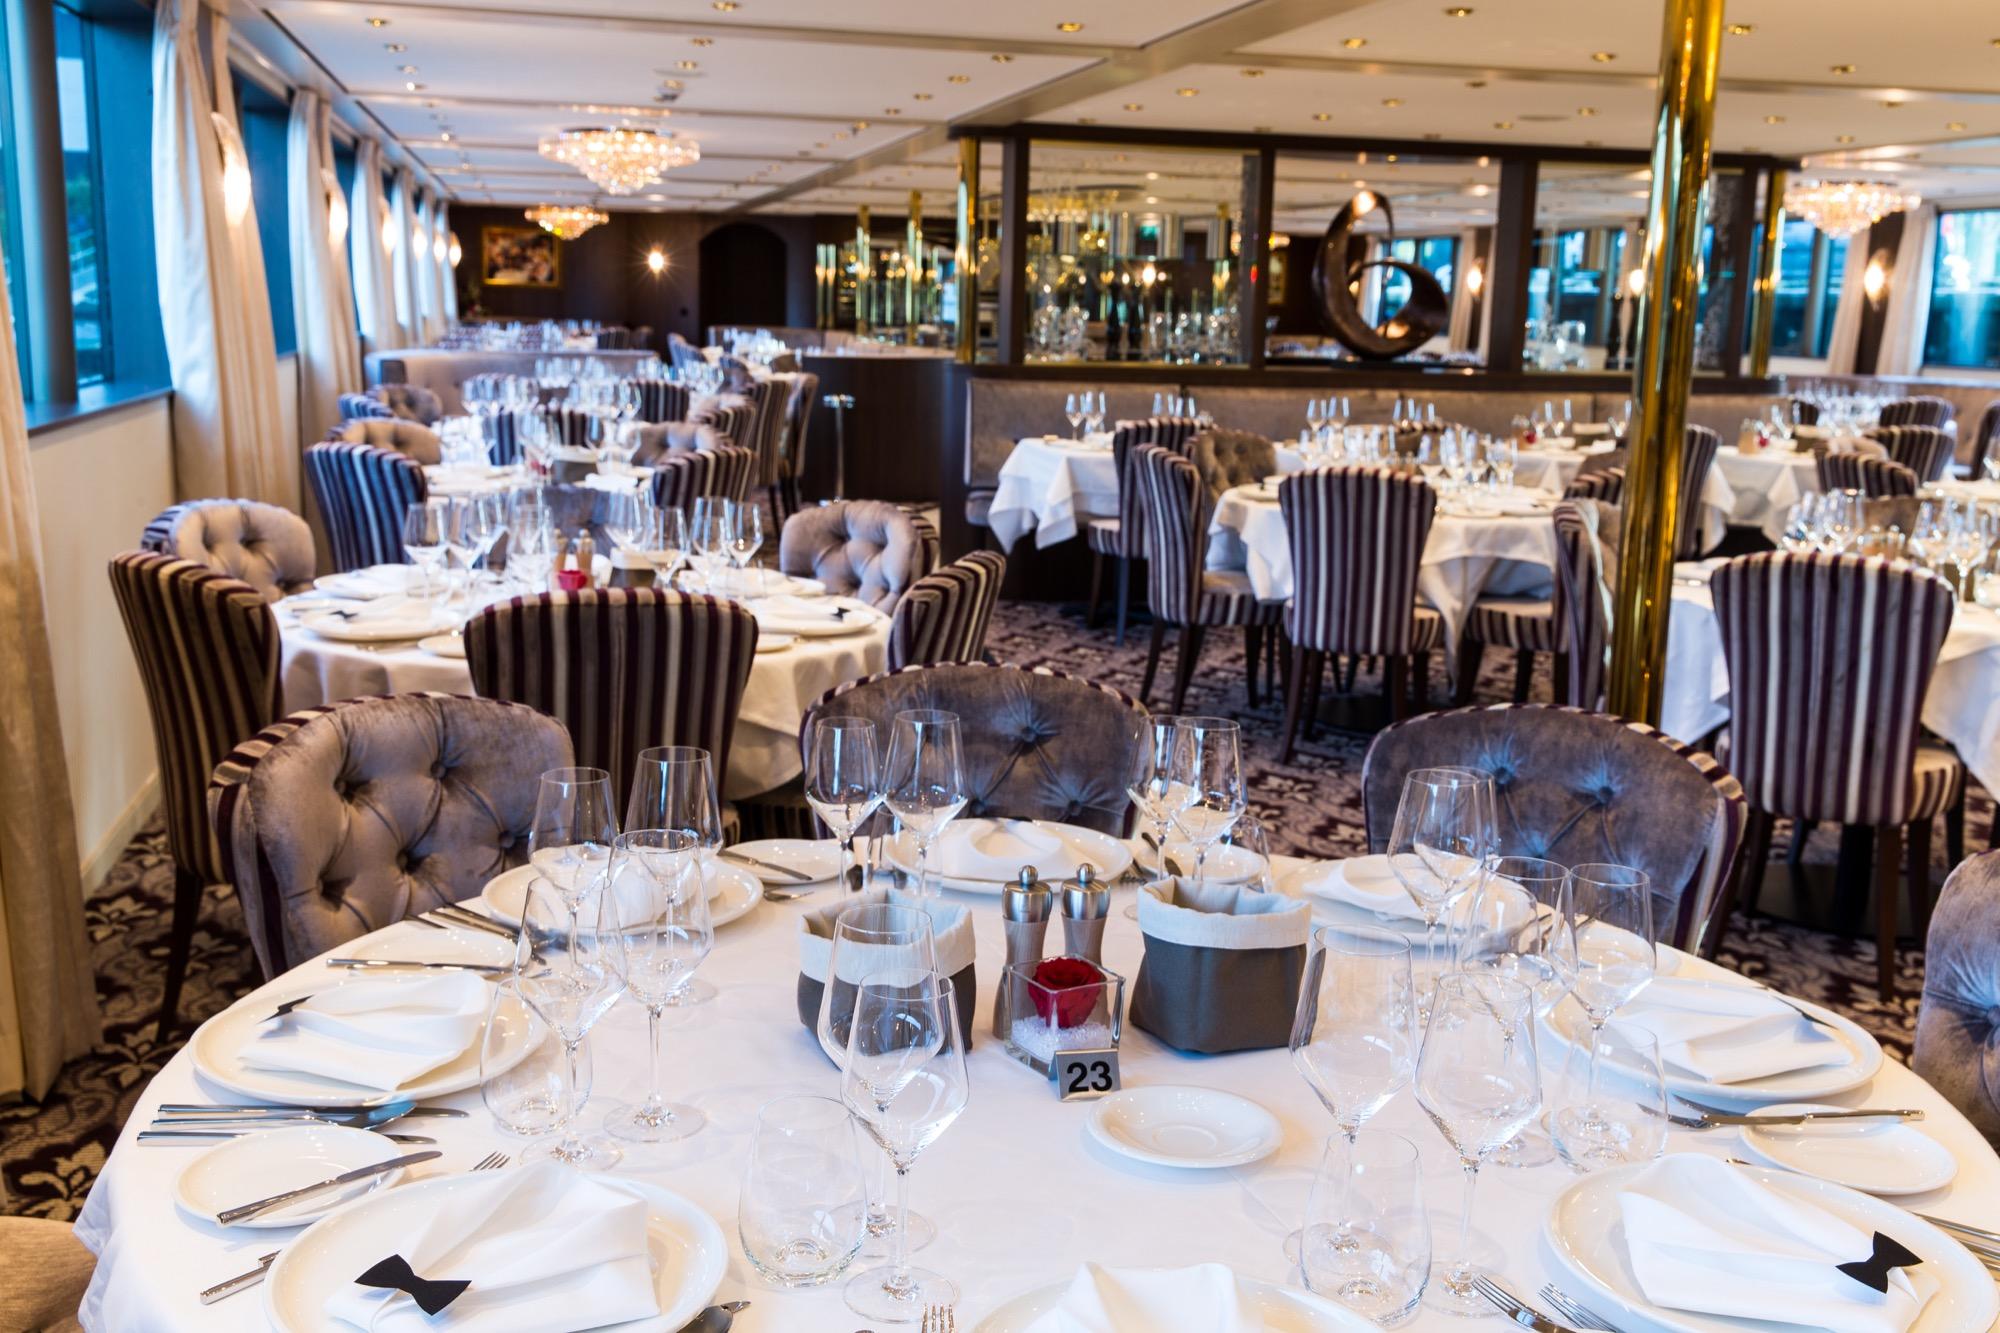 Riviera Travel Thomas Hardy Interior Restaurant 5.jpg